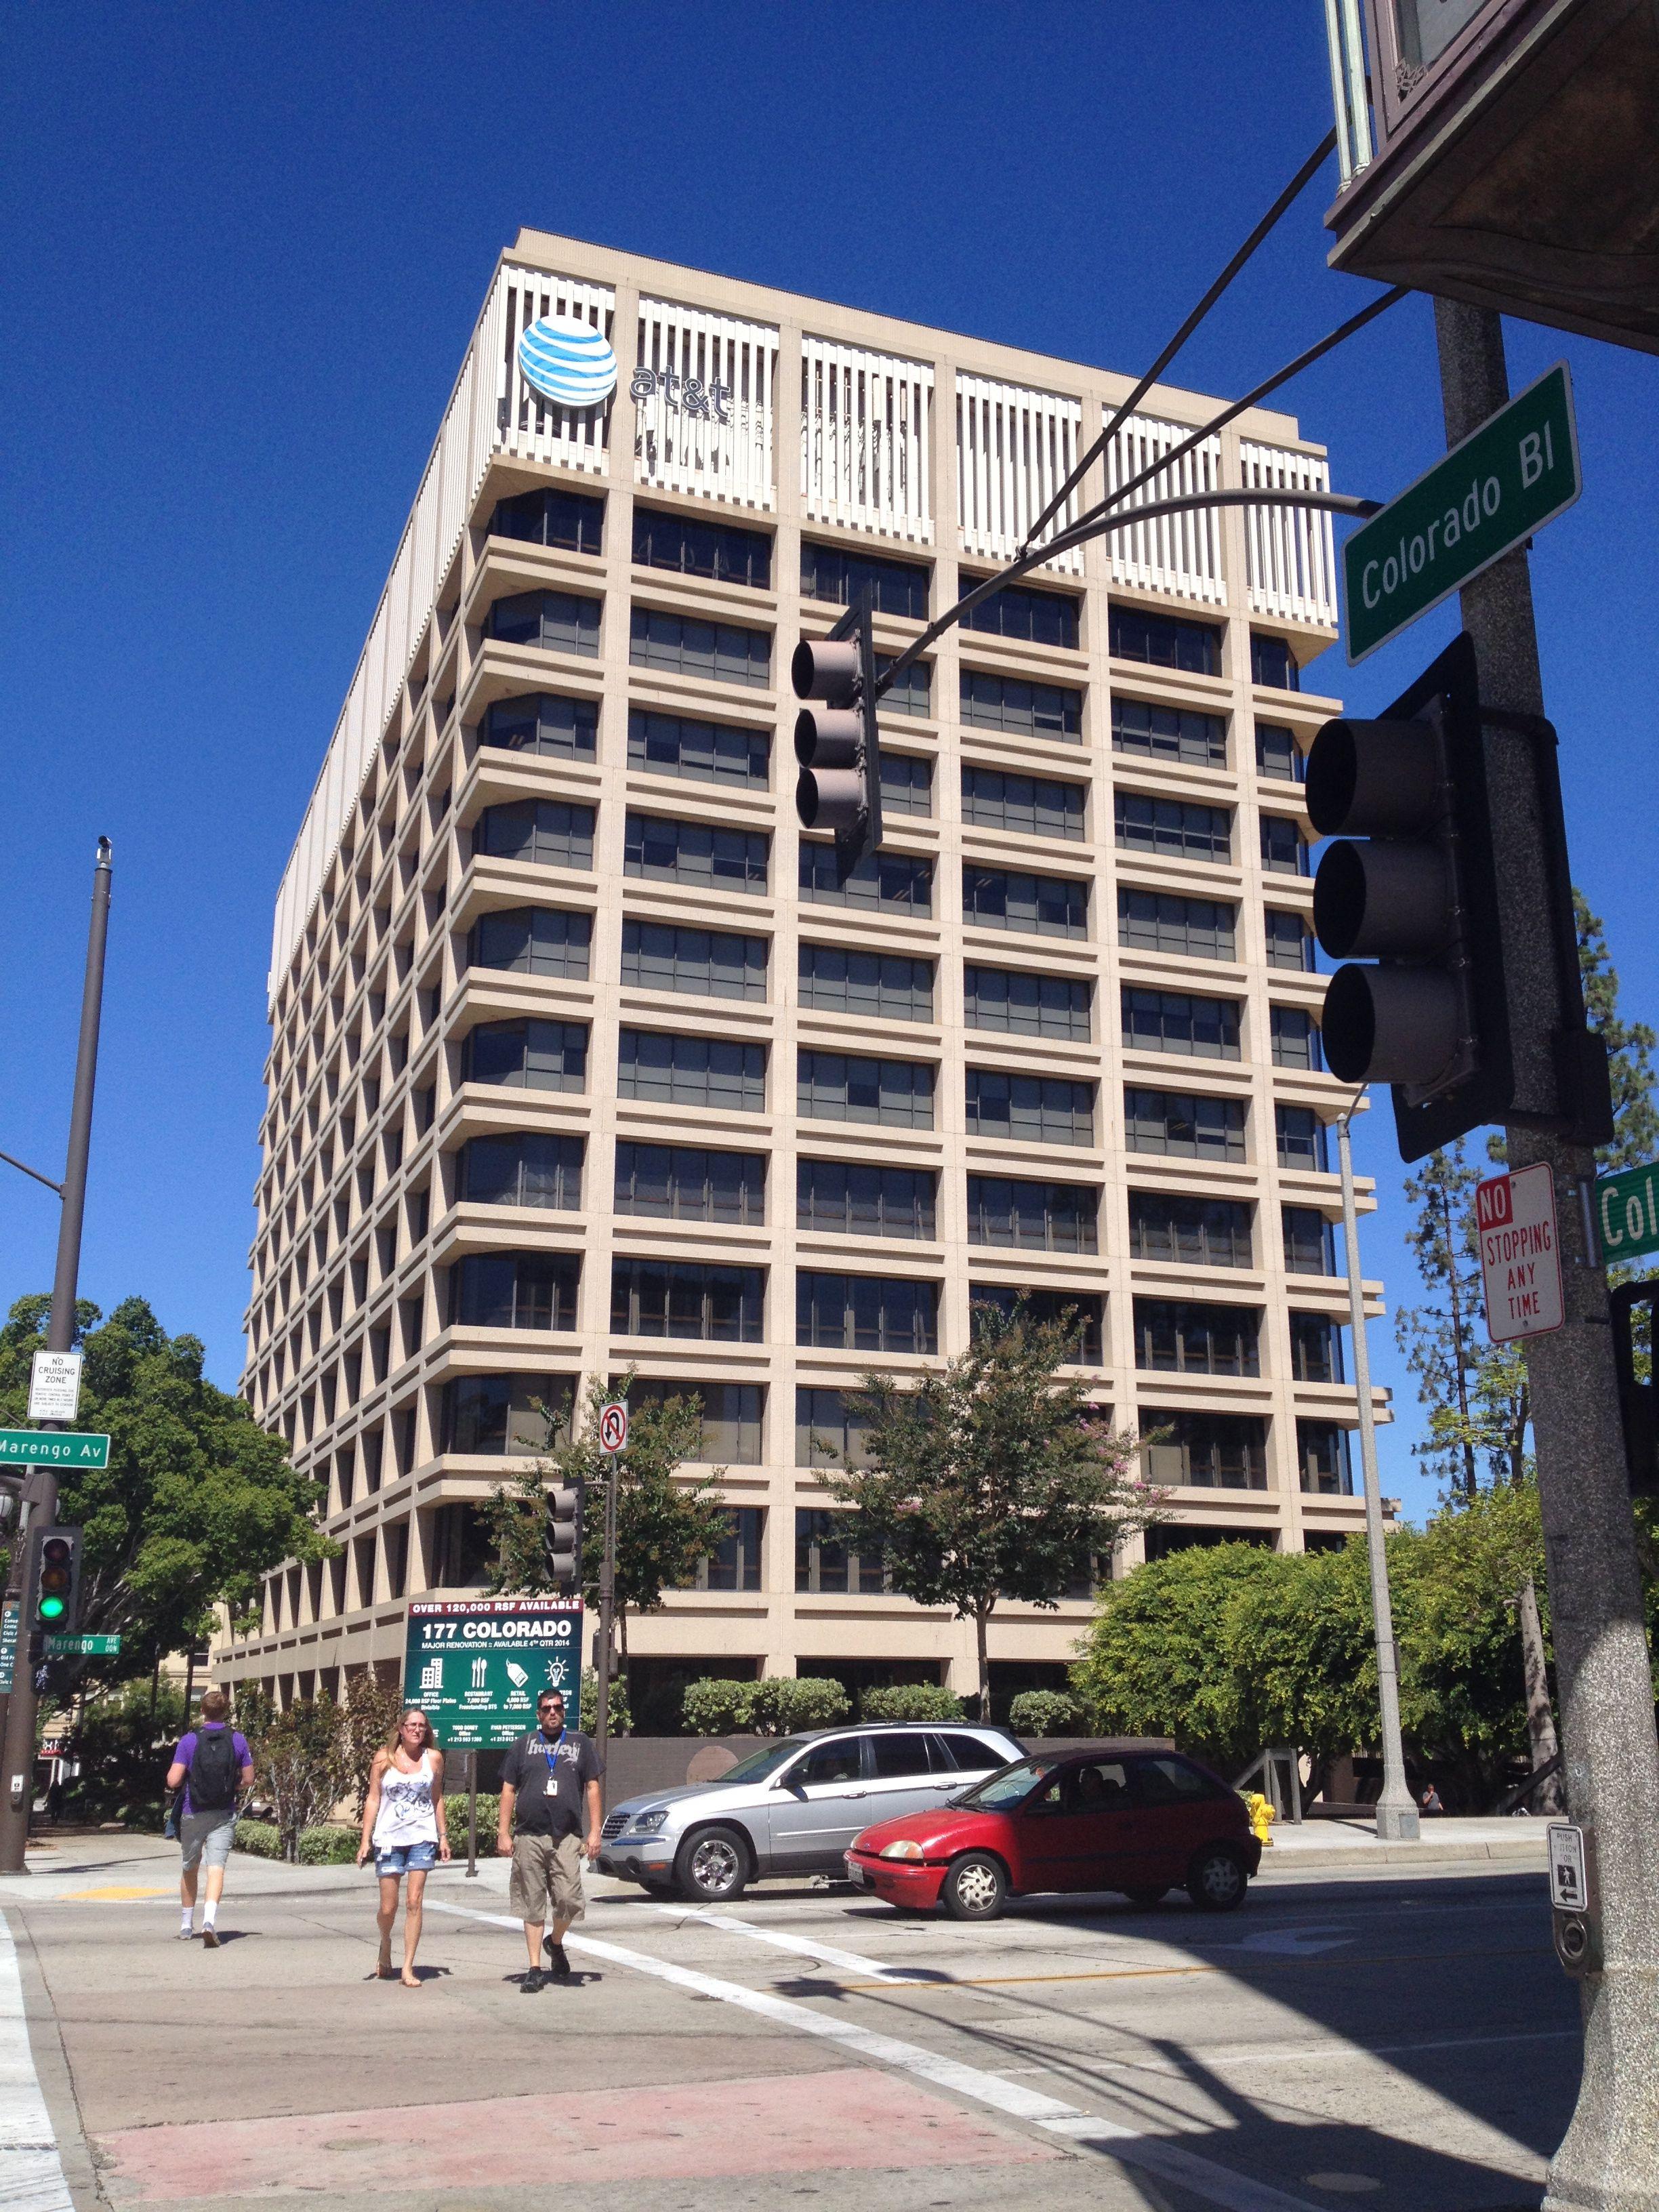 177 E. Colorado Blvd., Pasadena, CA, AKA the AT&T Tower ...